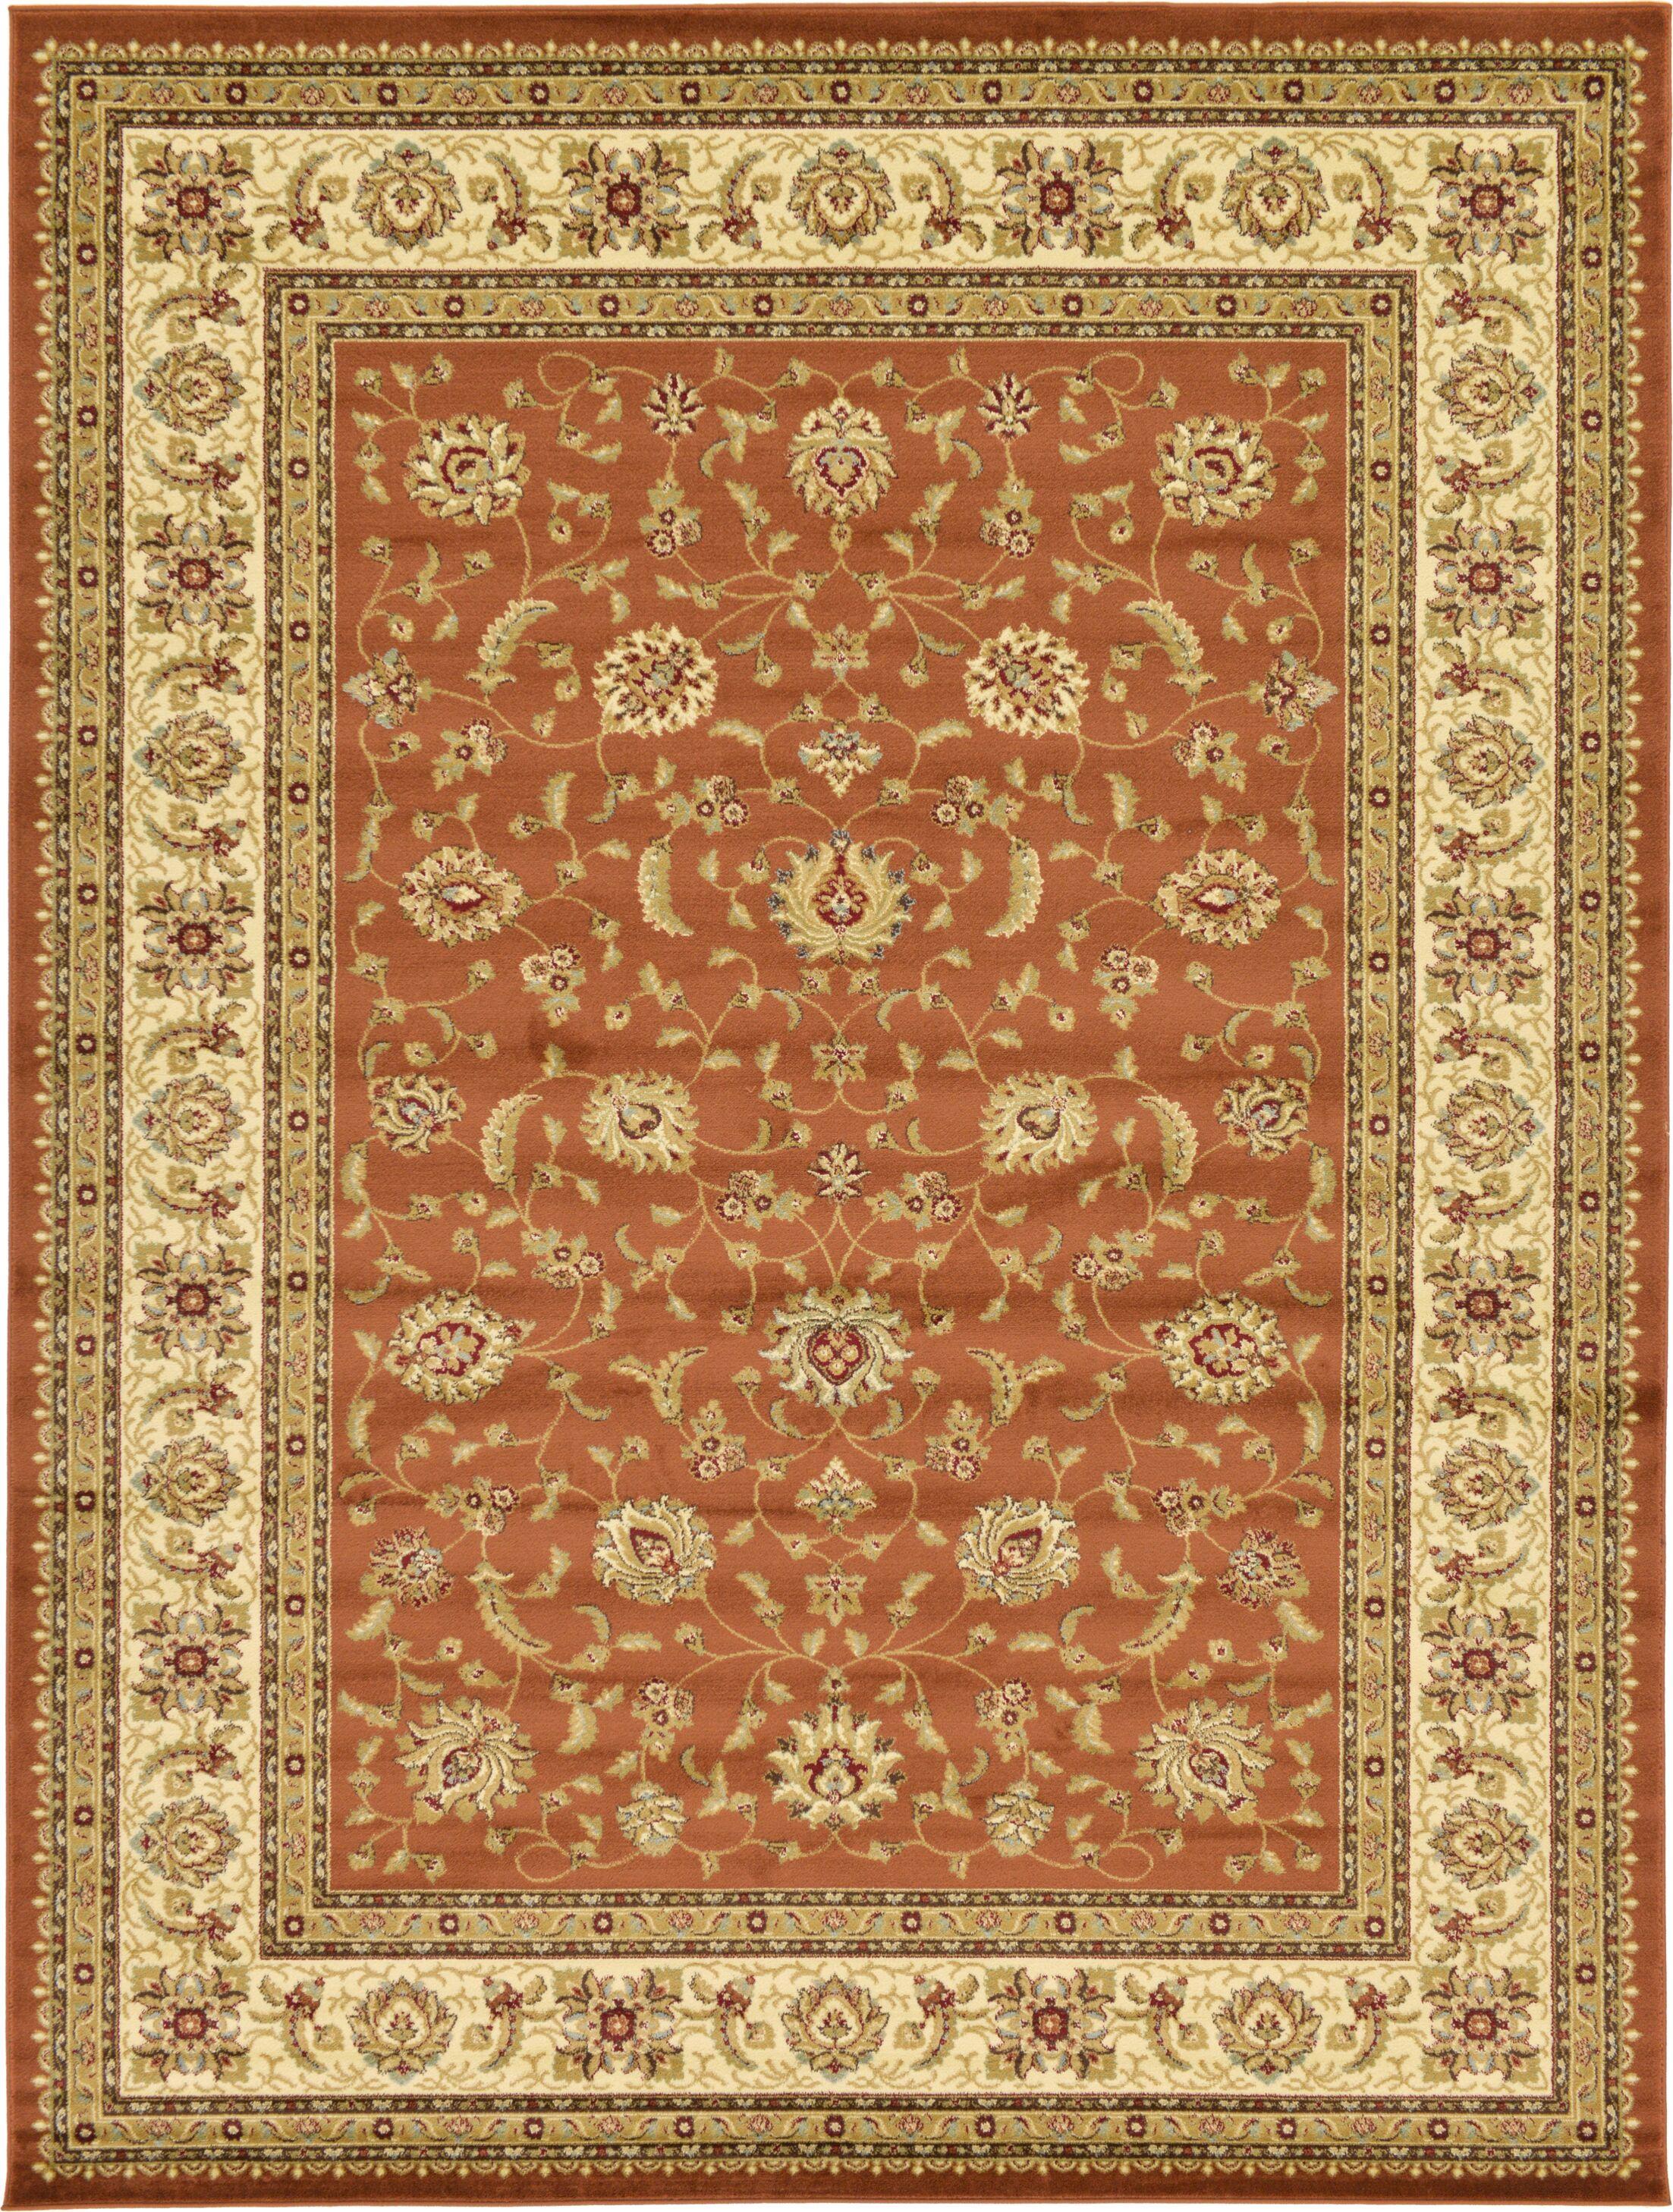 Fairmount Brick Red Oriental Area Rug Rug Size: Rectangle 9' x 12'